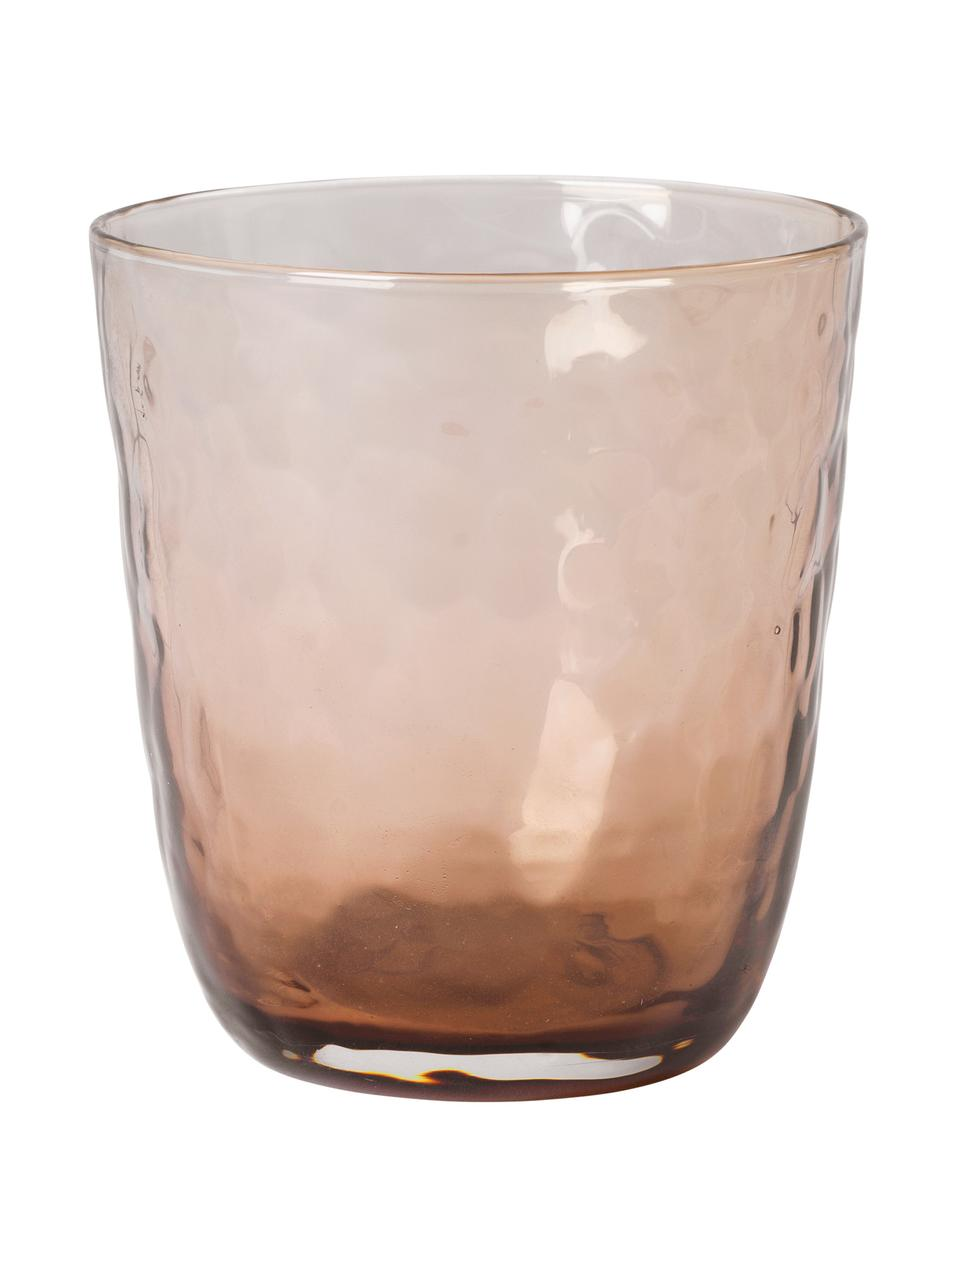 Bicchiere acqua in vetro soffiato irregolare Hammered 4 pz, Vetro, Marrone, Ø 9 x Alt. 14 cm